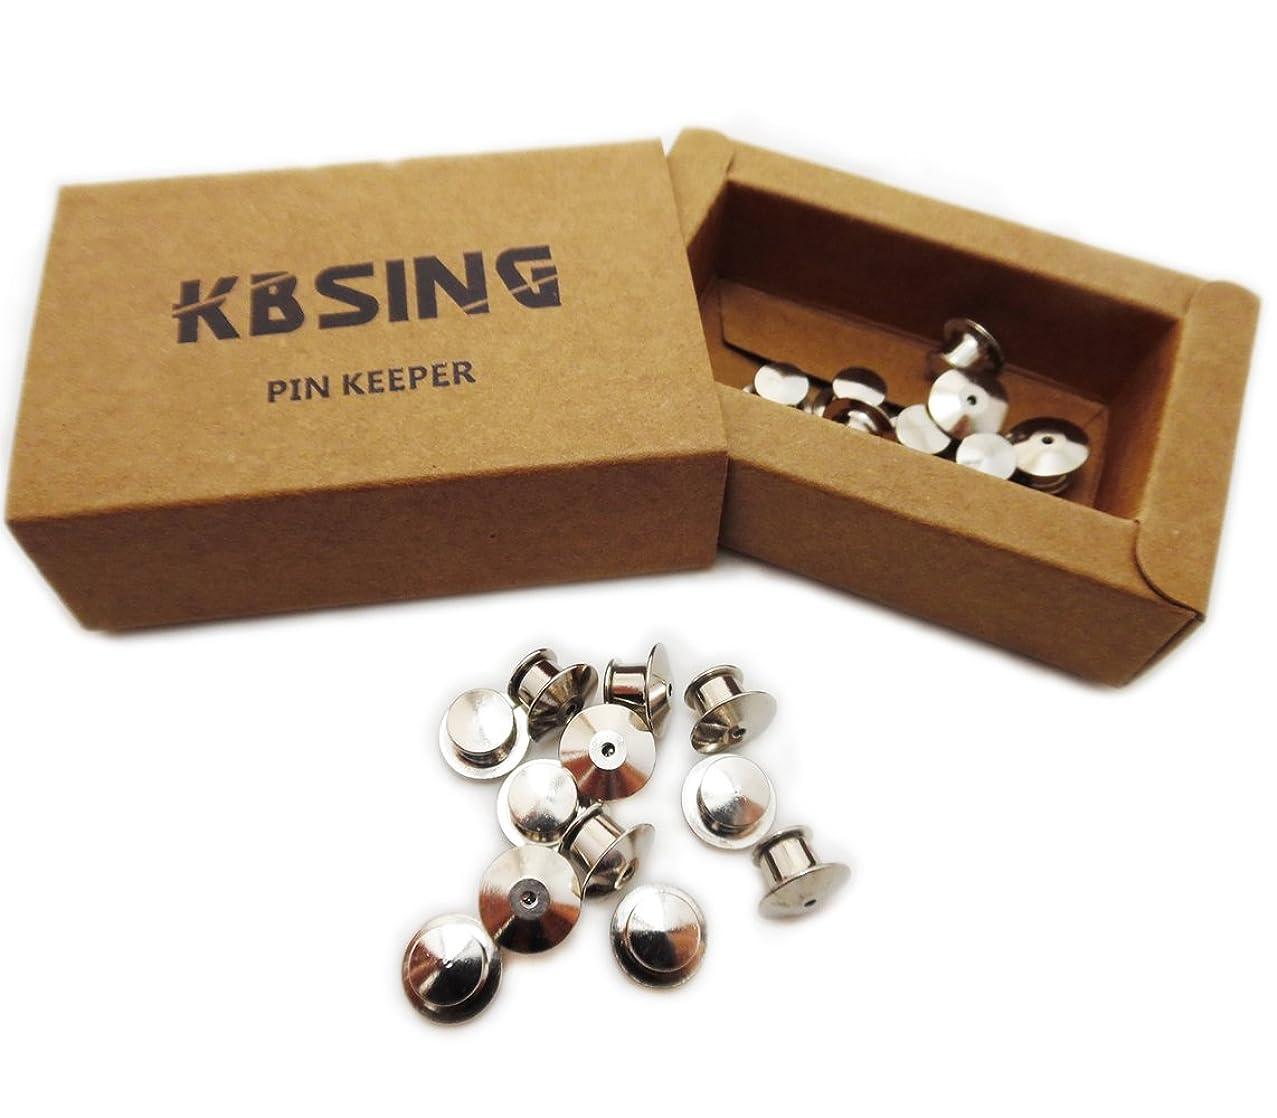 Kbsing 20 Pcs High Quality Locking Pin Keepers Backs (Silver)